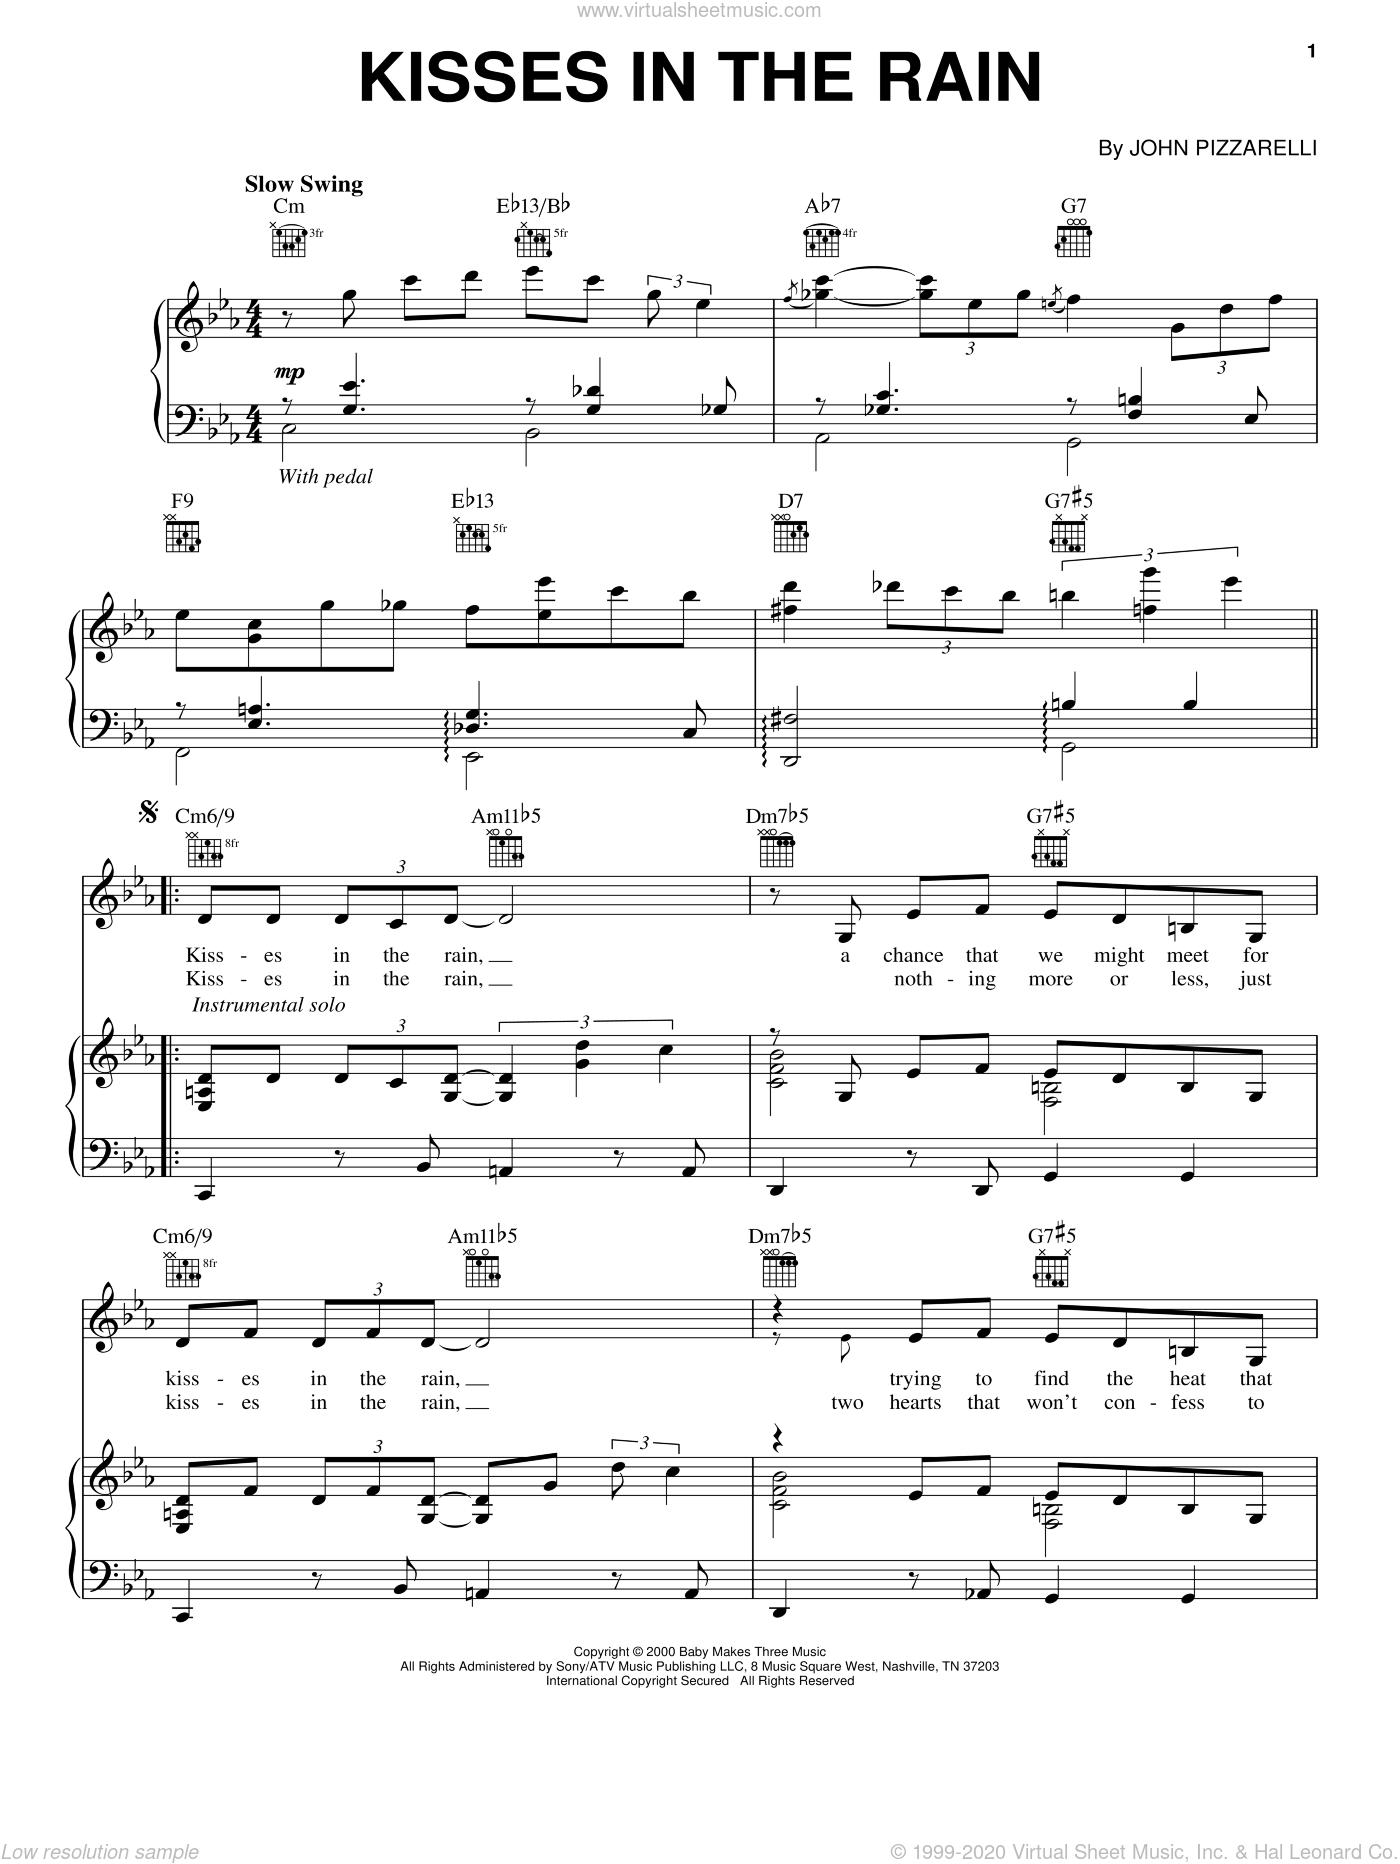 Kisses In The Rain sheet music for voice, piano or guitar by John Pizzarelli, intermediate skill level